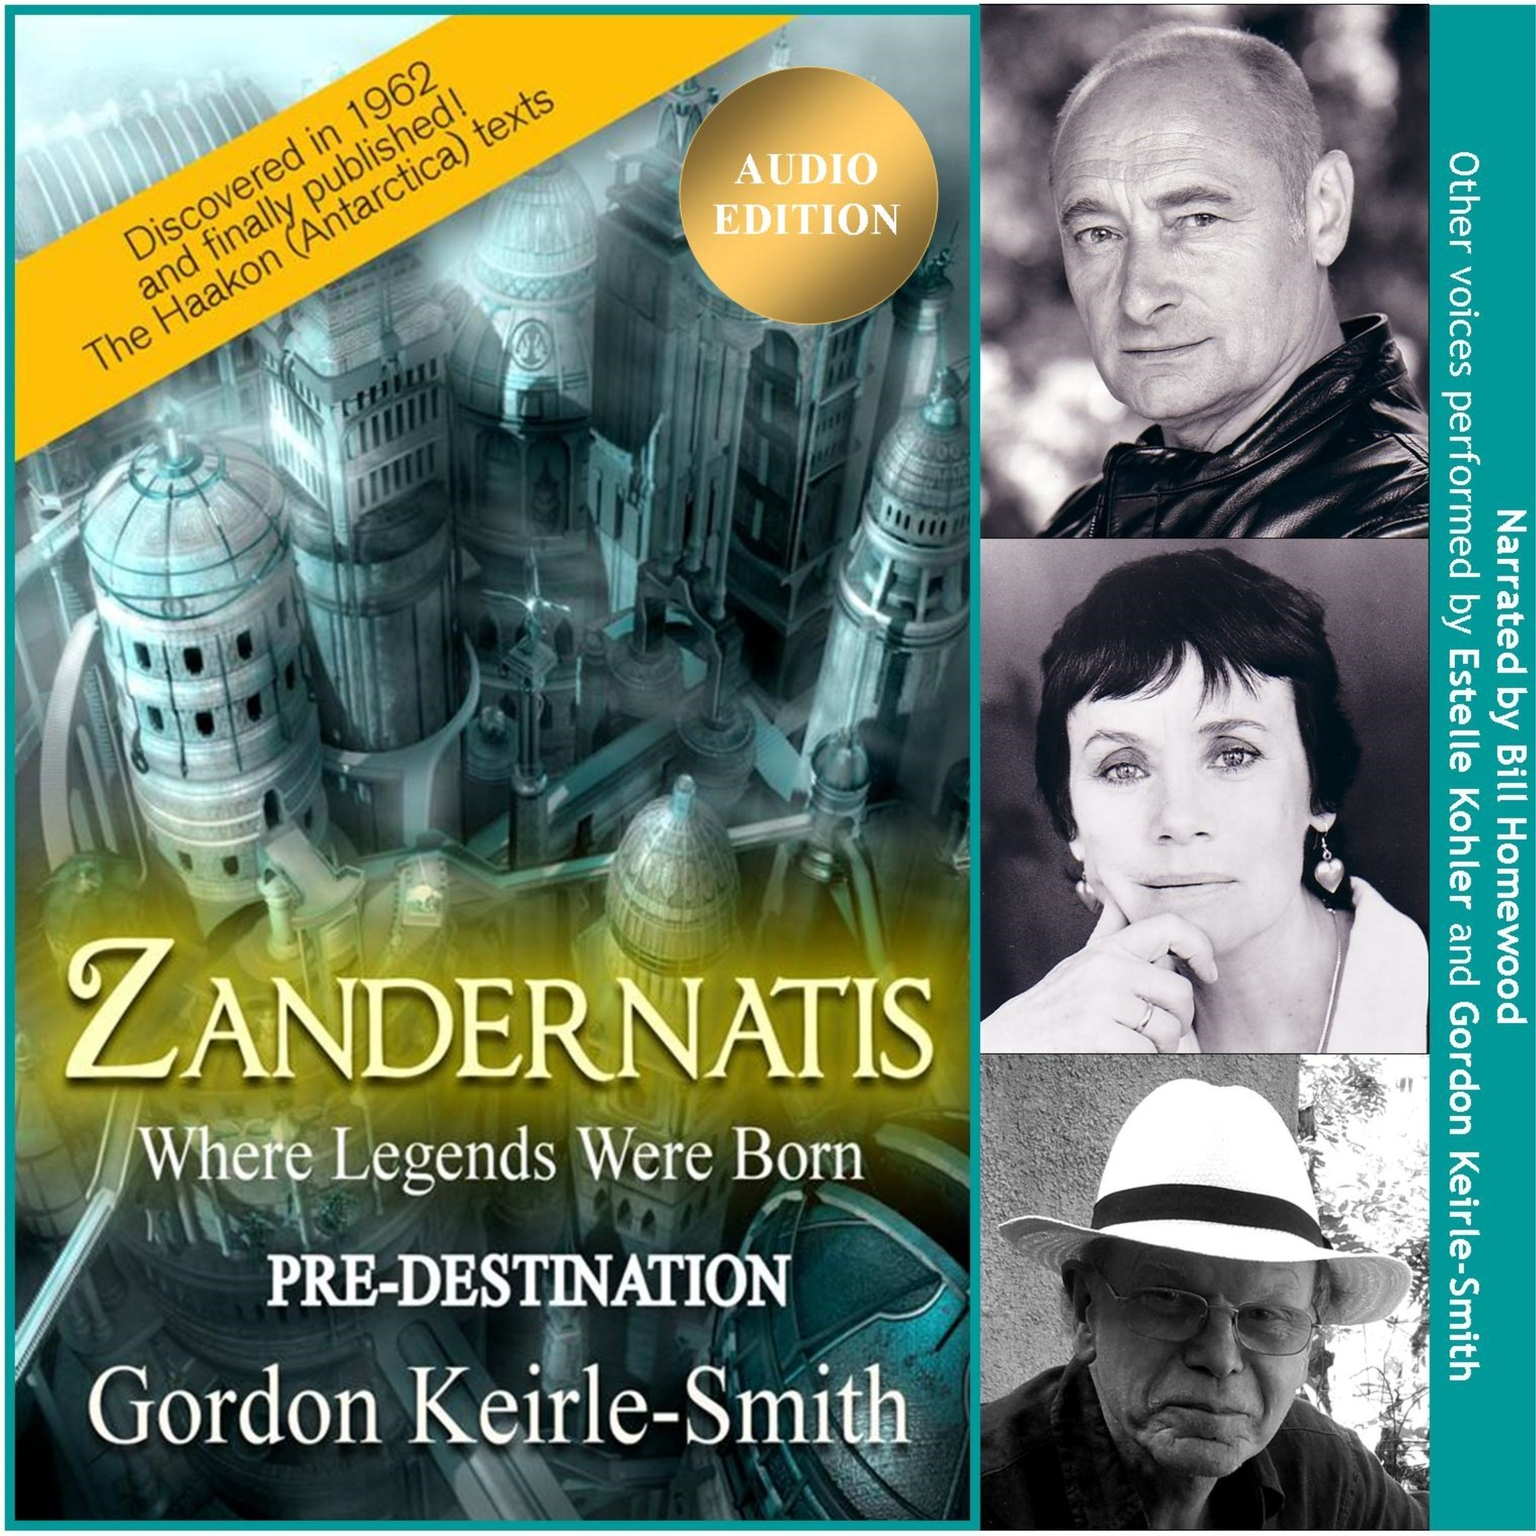 Zandernatis - Volume One - Pre-Destination Audiobook, by Gordon Keirle-Smith